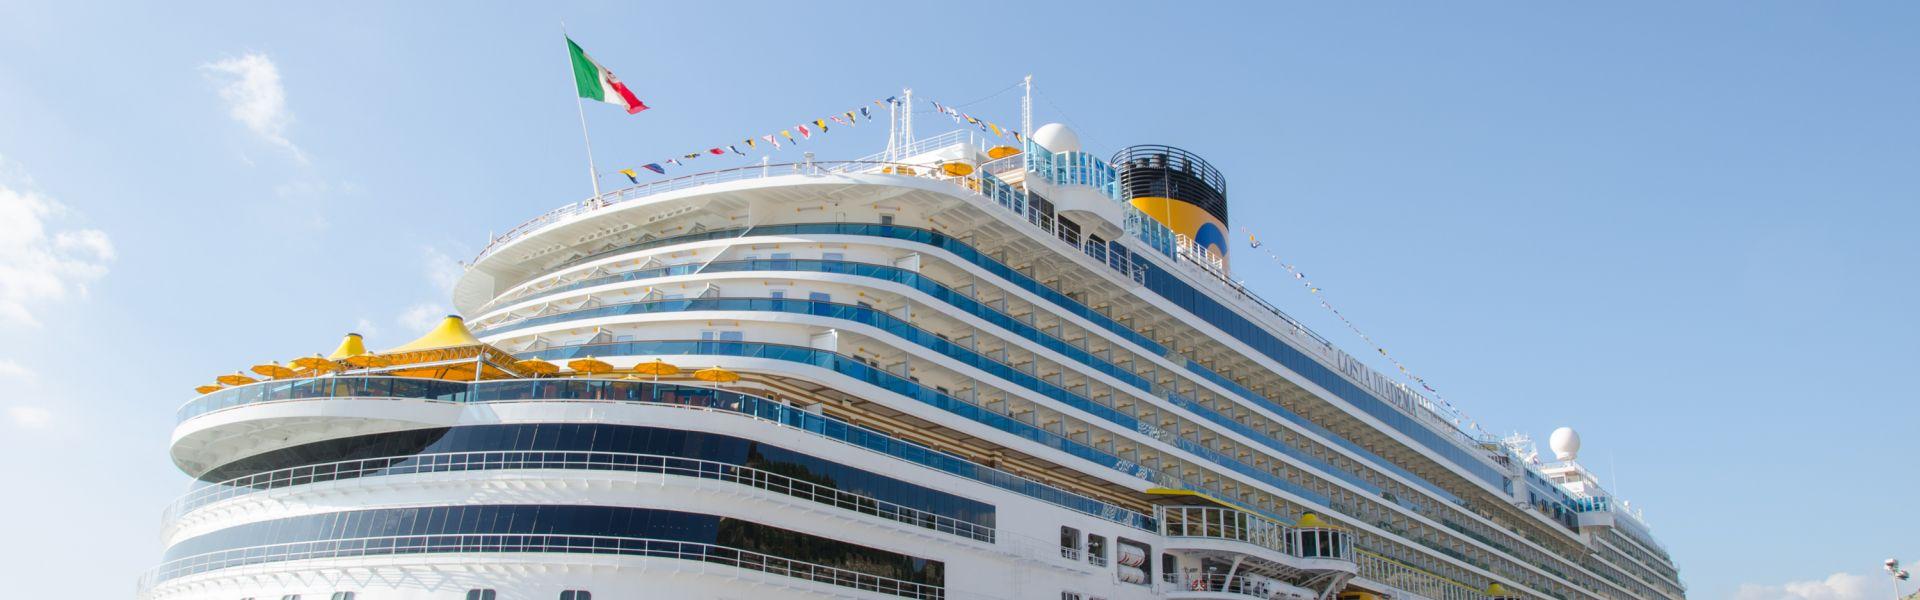 Croaziera 2018 - Mediterana de Vest (Savona) - Costa Cruises - Costa Diadema - 7 nopti